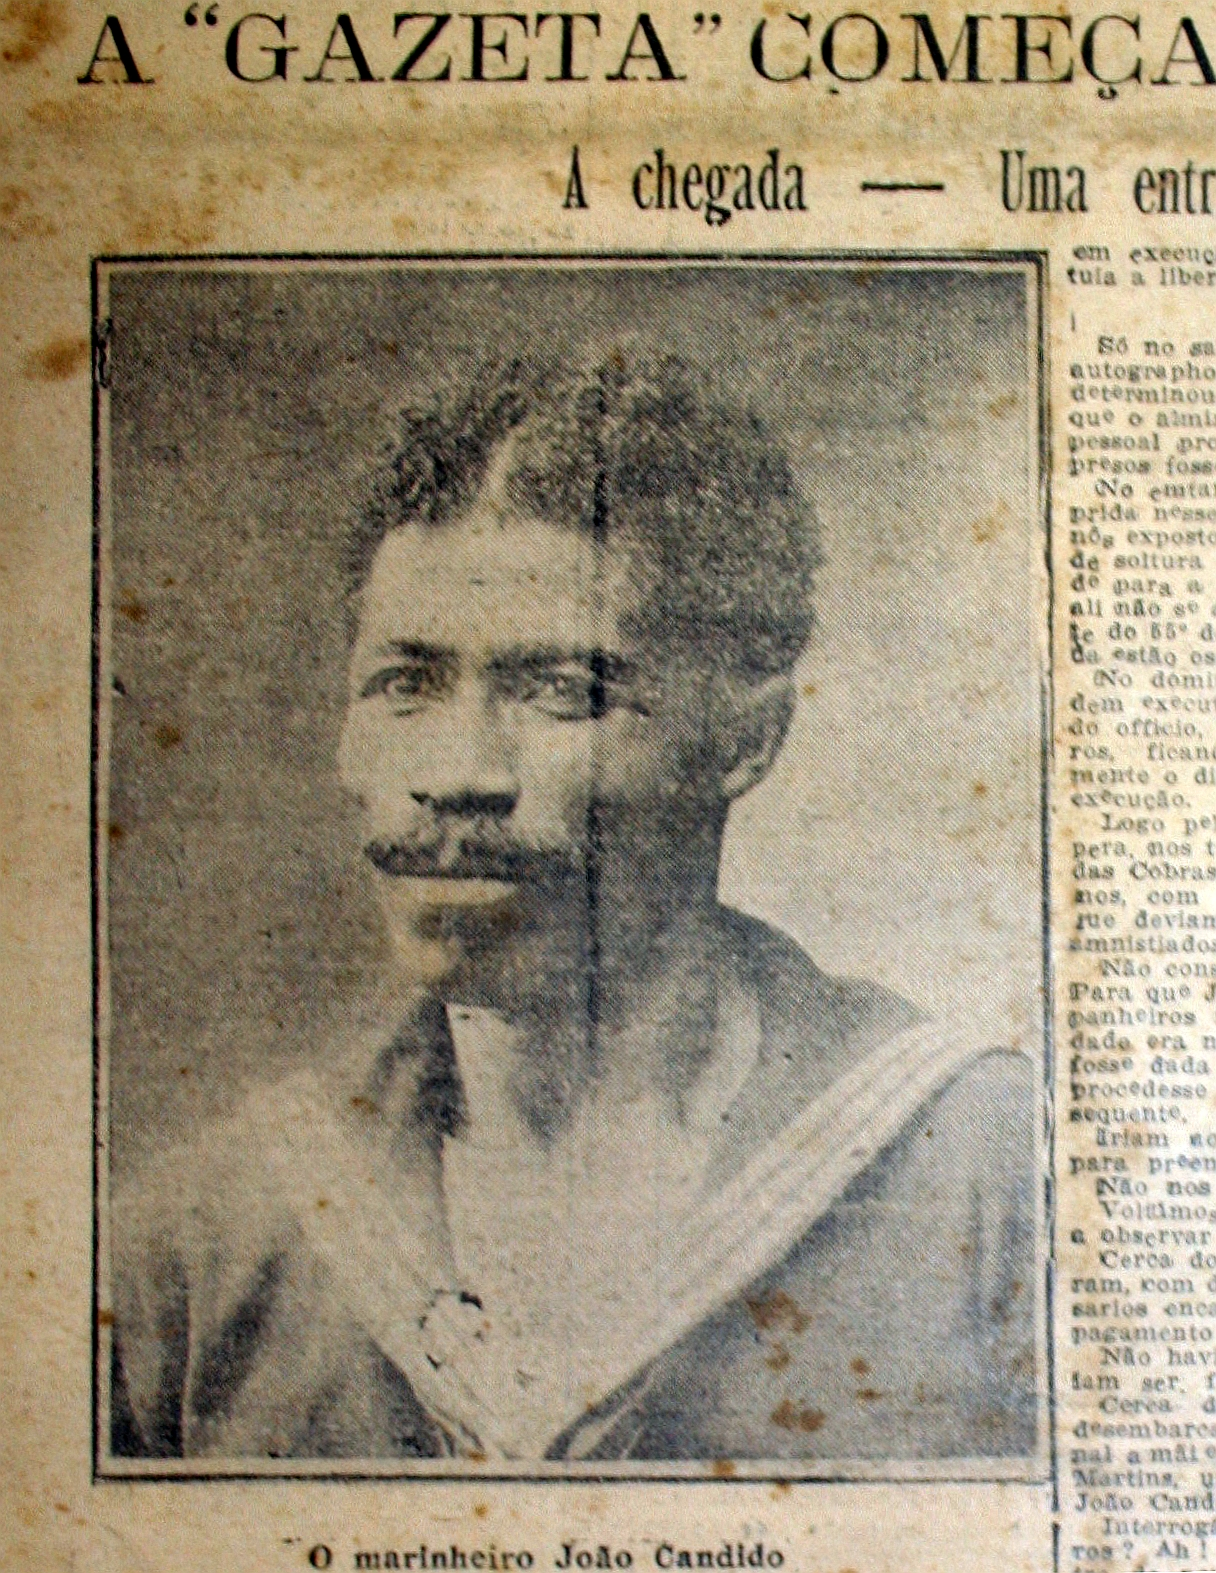 https://upload.wikimedia.org/wikipedia/commons/7/70/Gazeta_de_noticias_31-12-1912_02.jpg